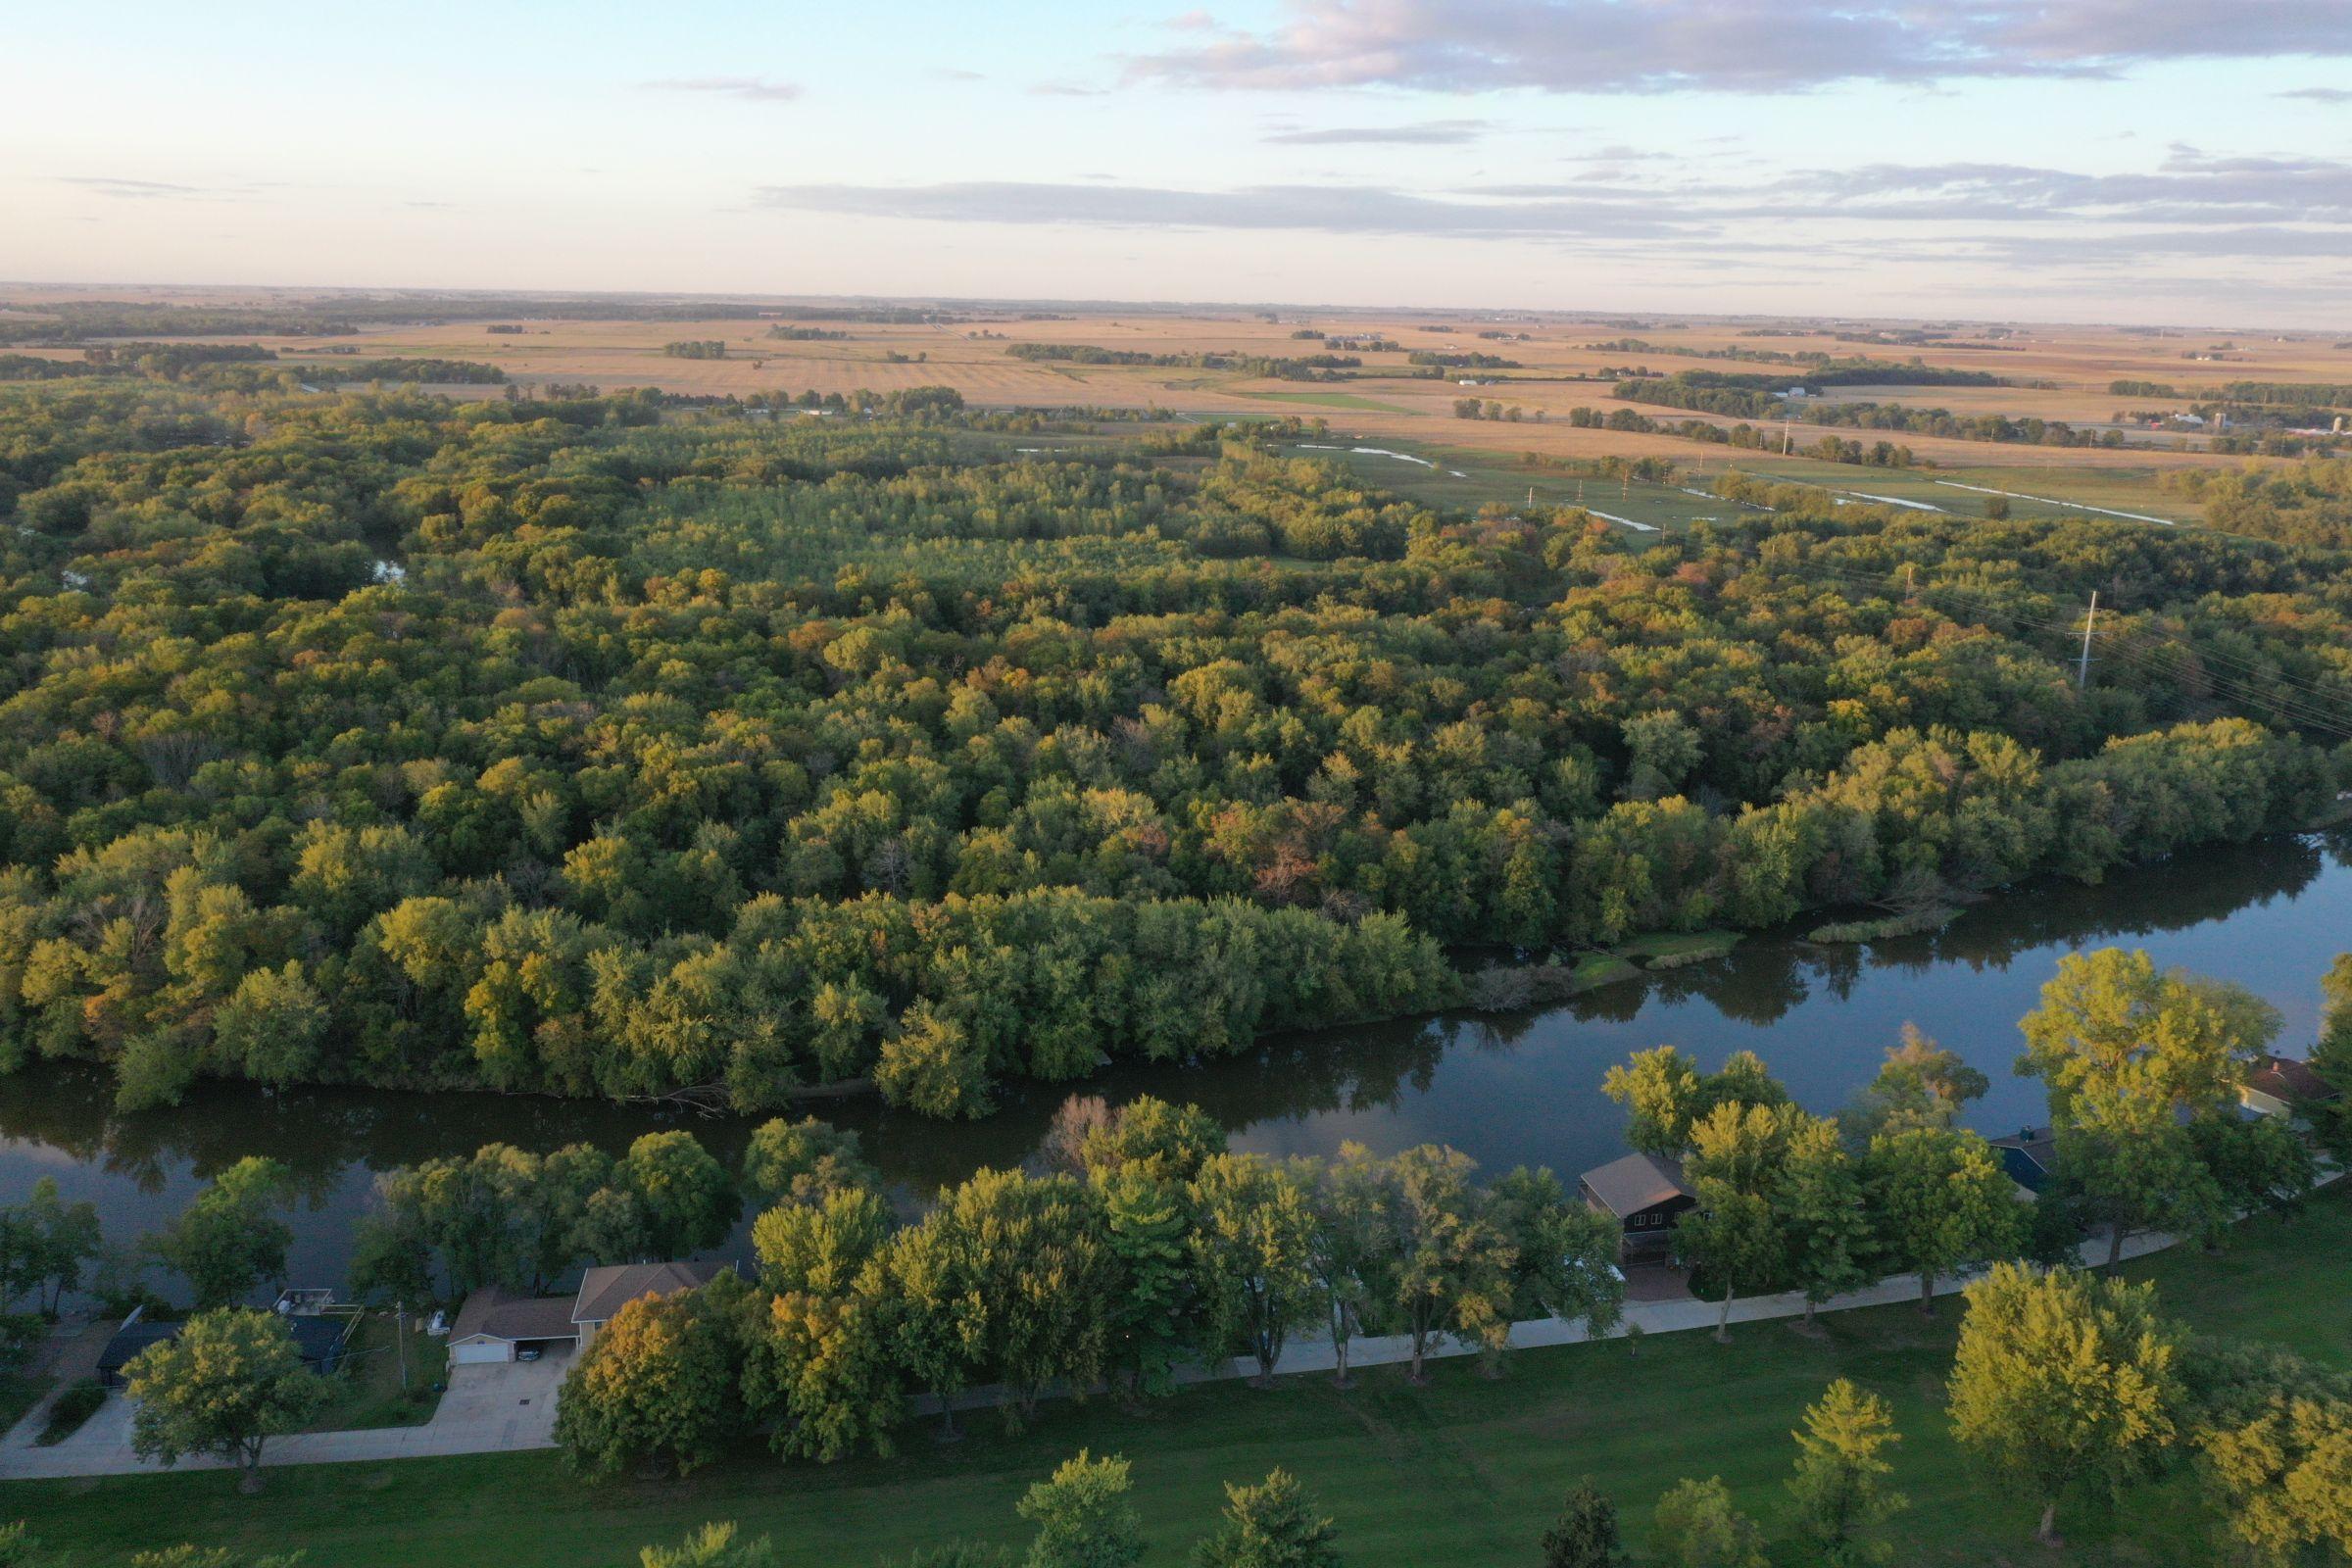 land-buchanan-county-iowa-33-acres-listing-number-14906-0-2020-10-28-160729.JPG